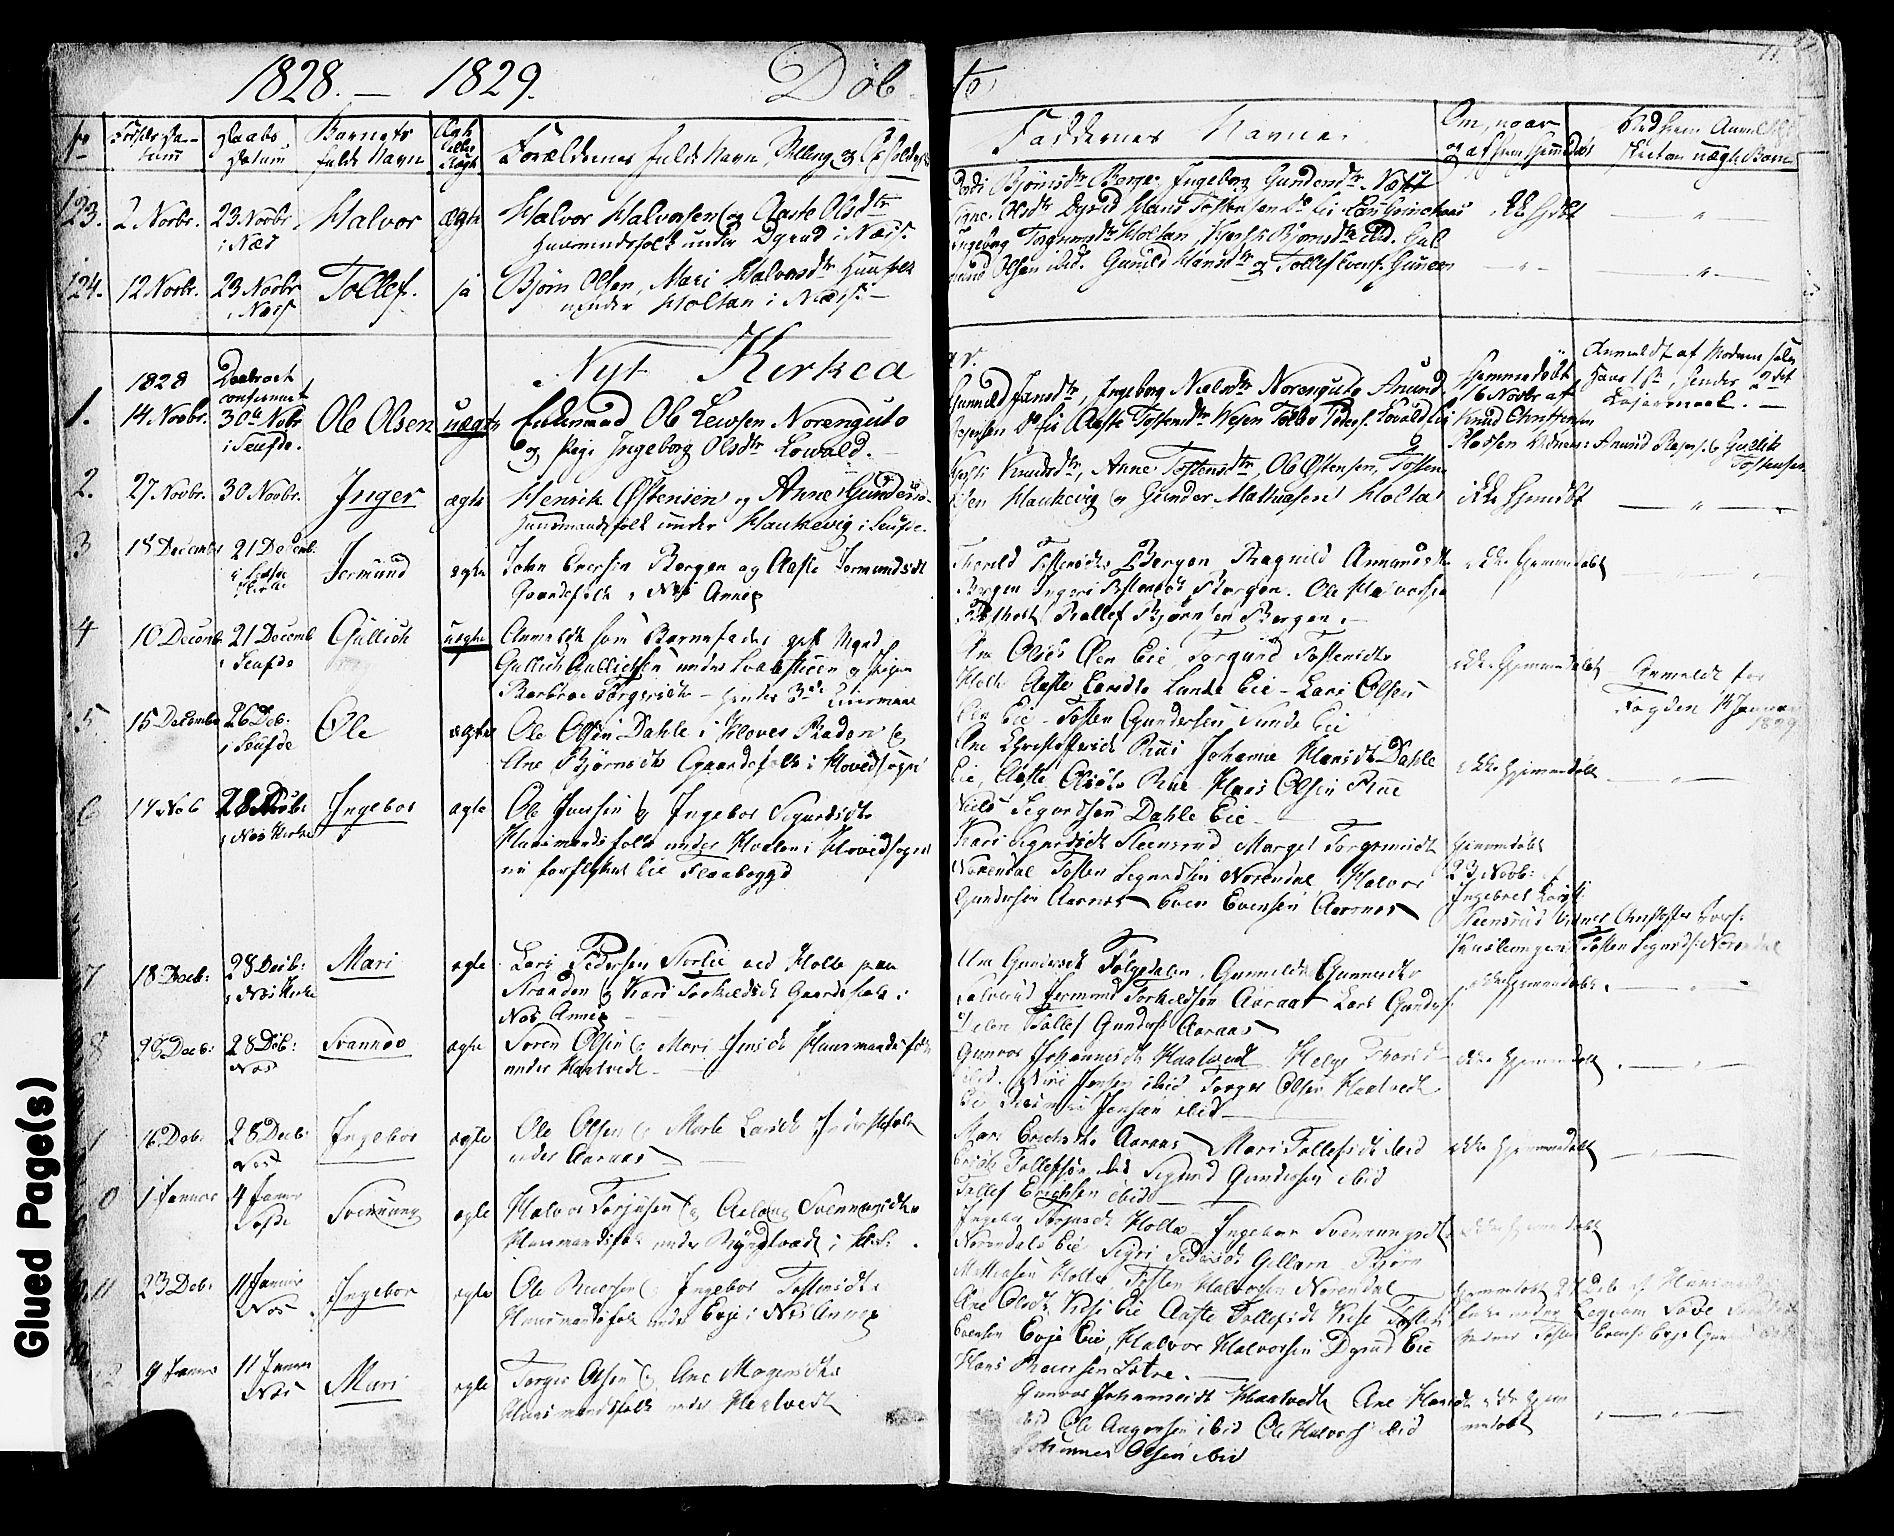 SAKO, Sauherad kirkebøker, F/Fa/L0006: Ministerialbok nr. I 6, 1827-1850, s. 11